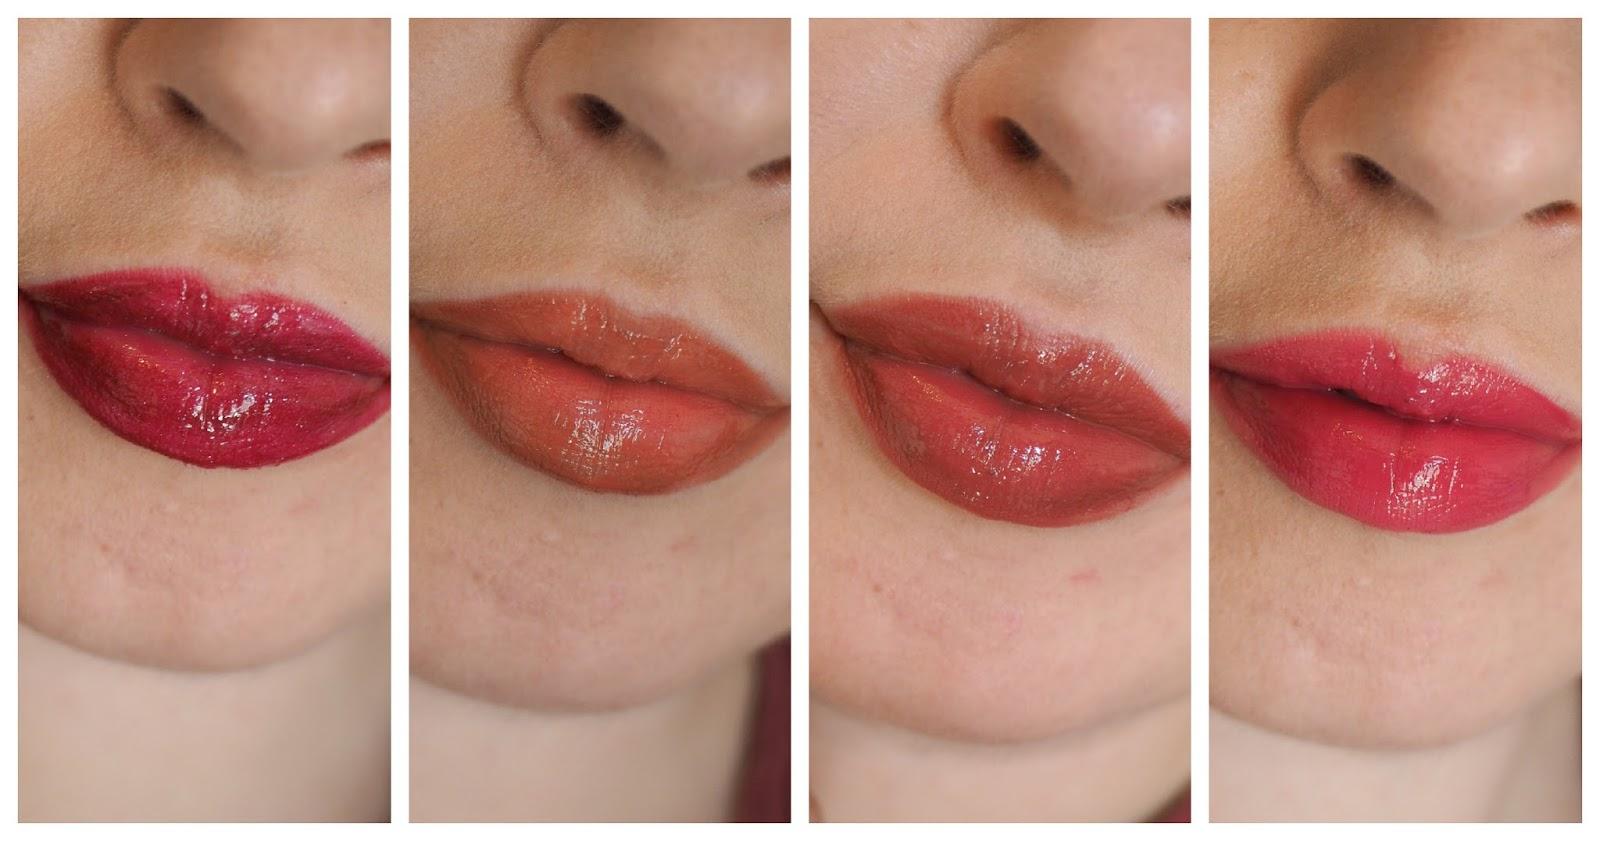 M&SBeauty: Autograph Colour Shine Lip Lacquer Lipgloss + Swatches*